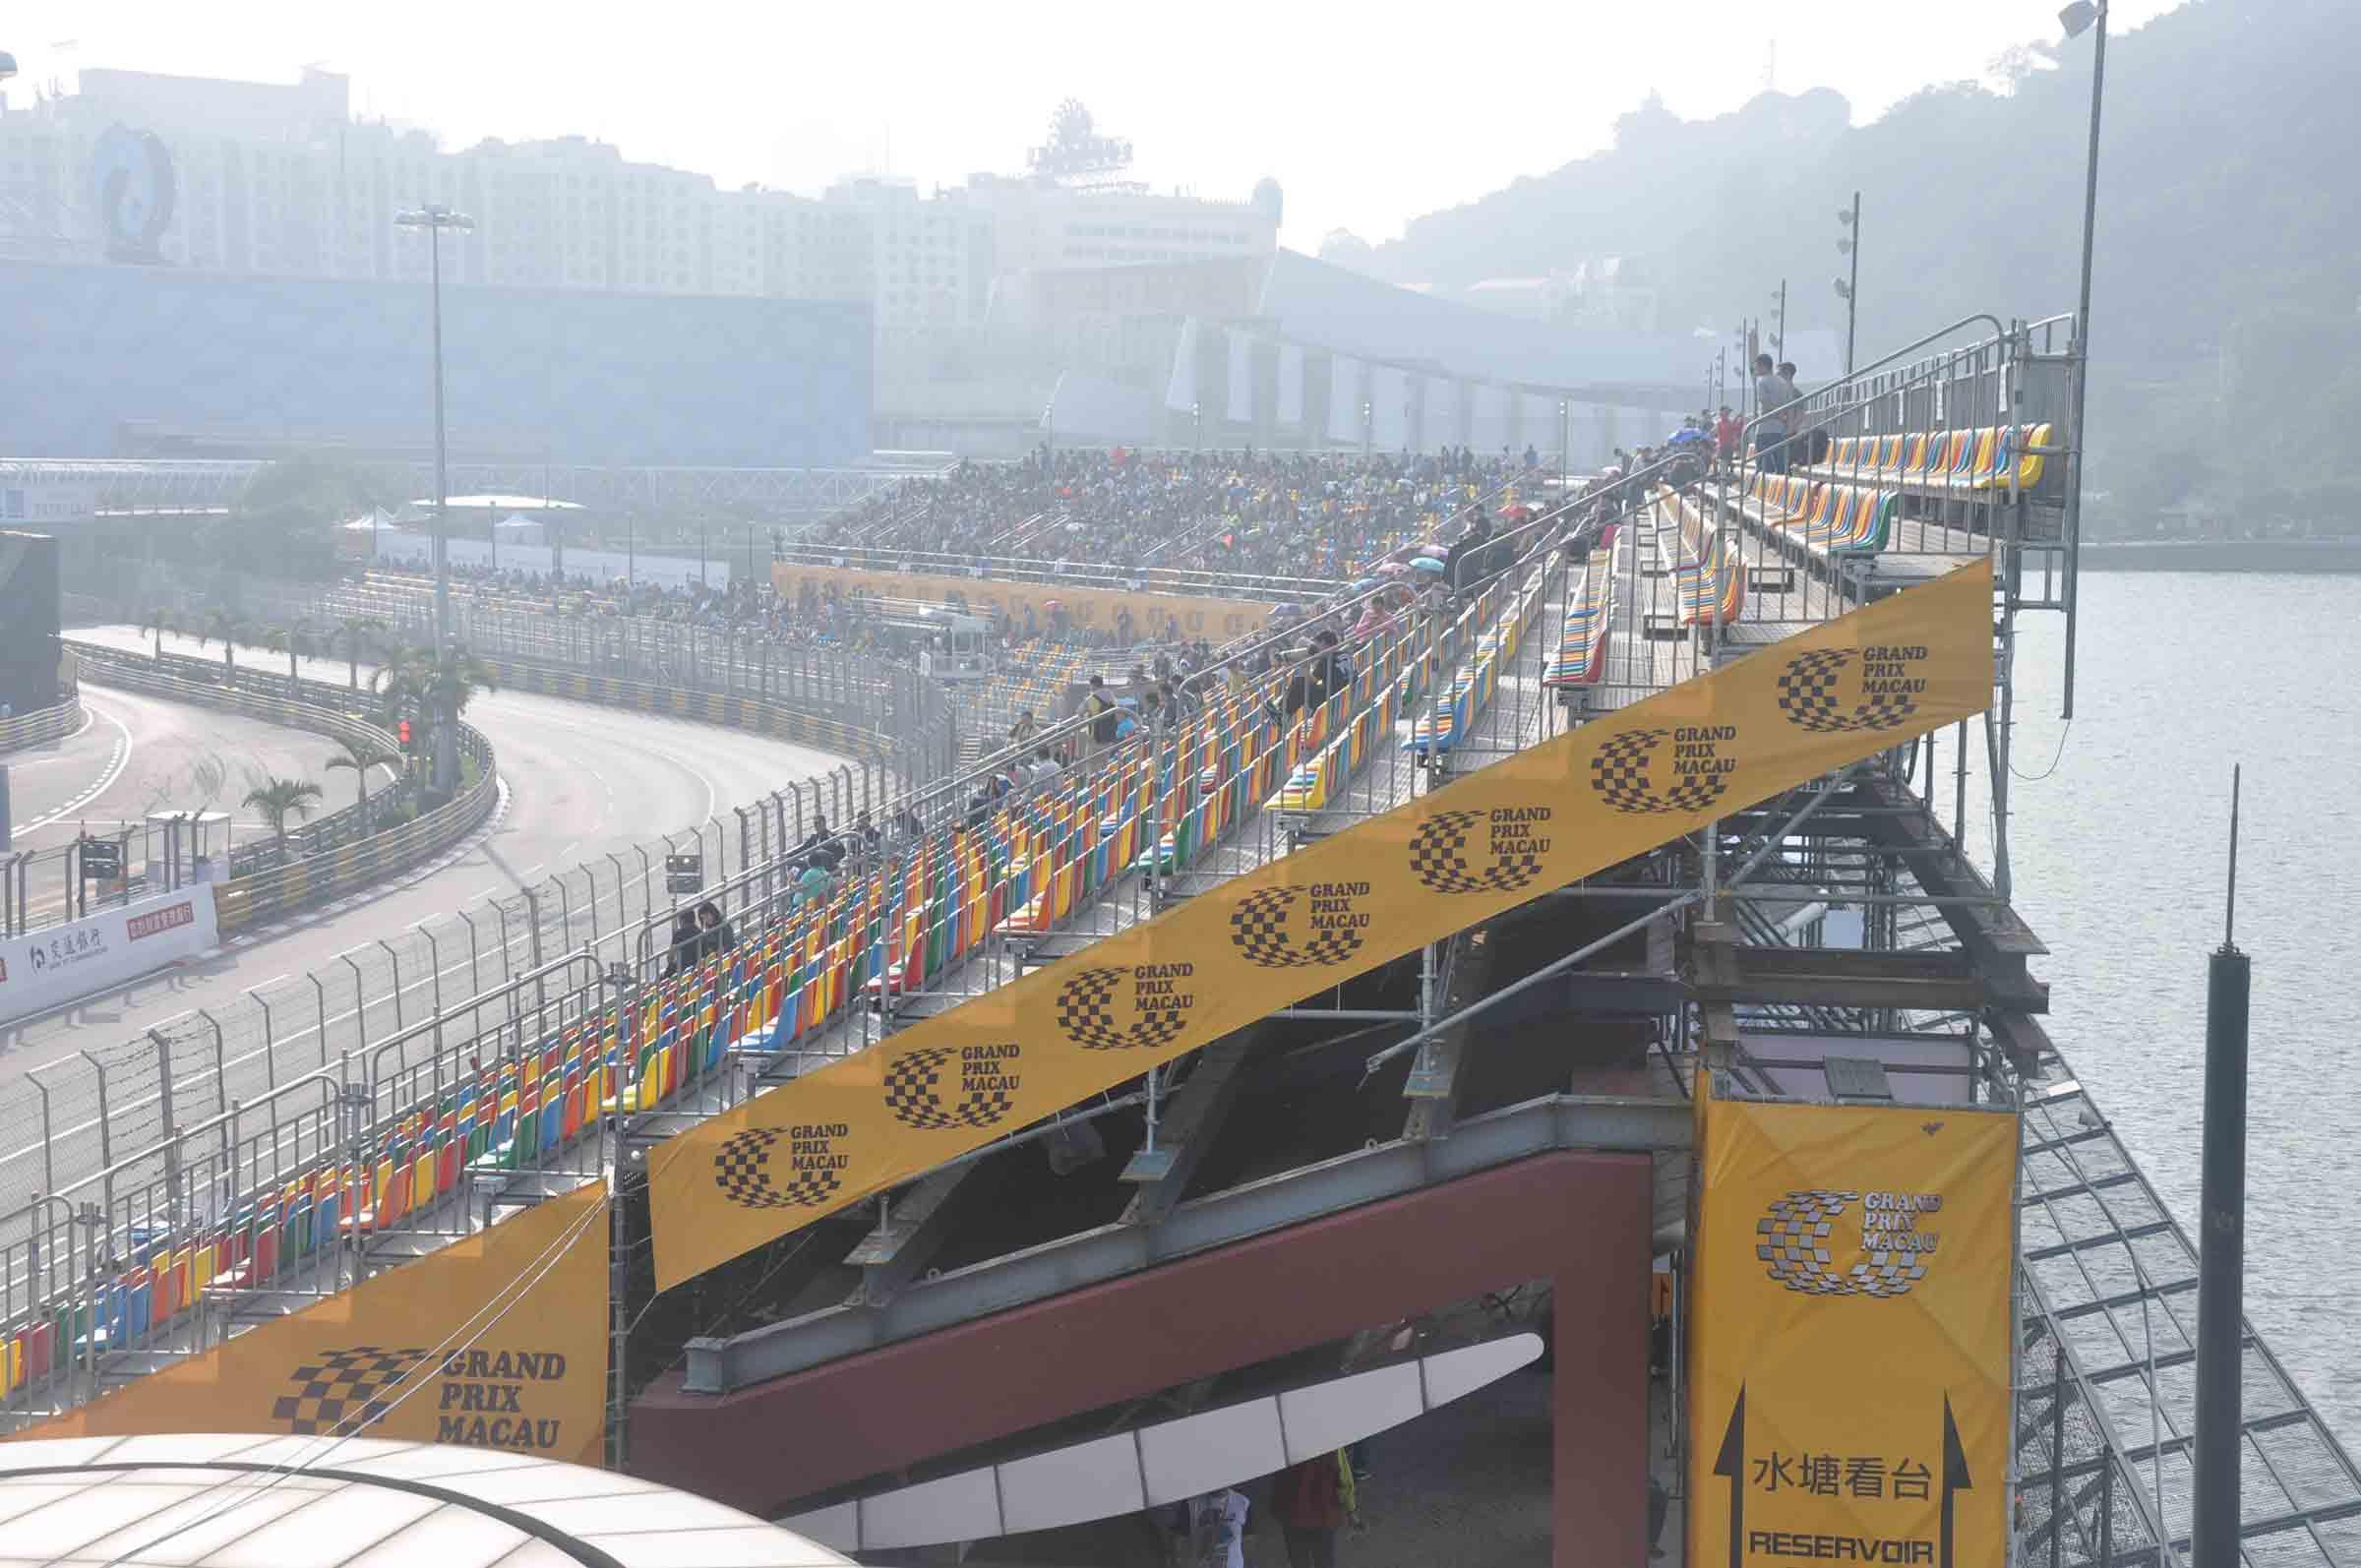 Macau F3 Grand Prix Race Reservoir Stand